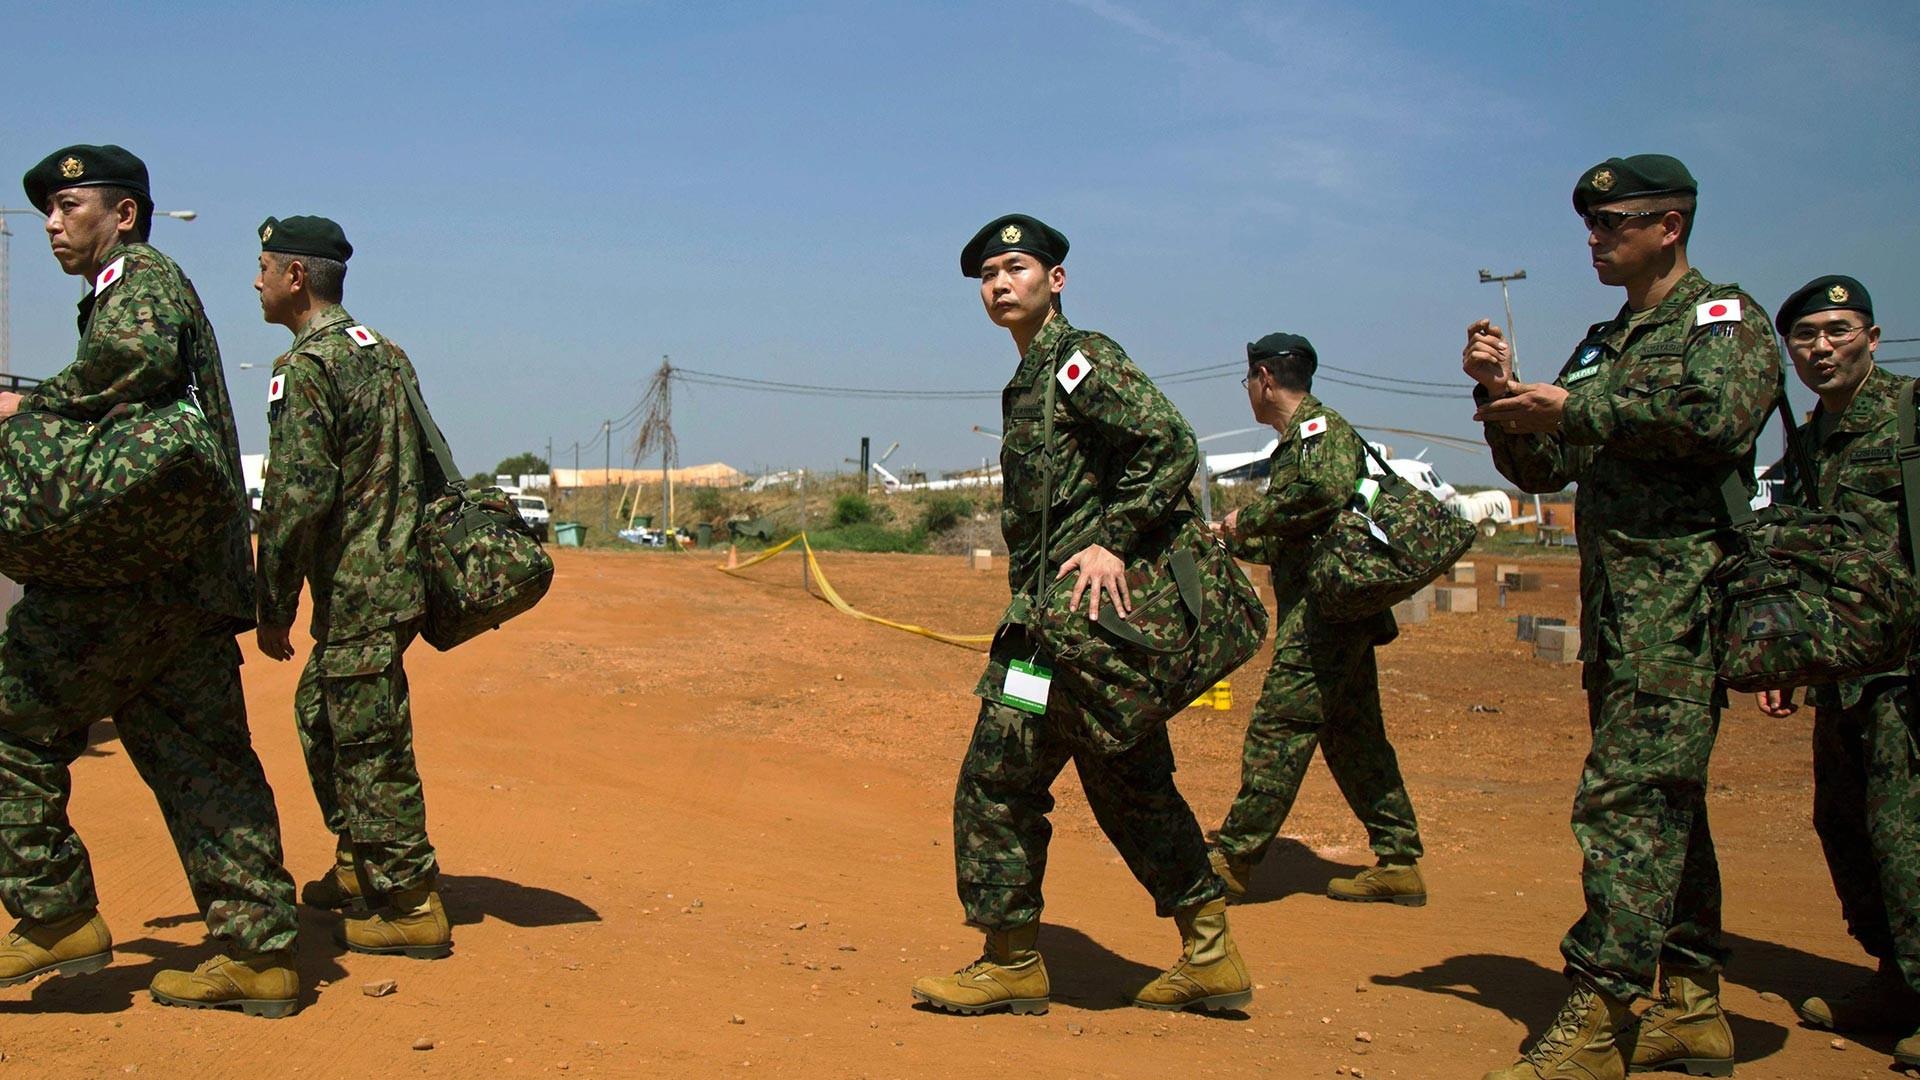 <p>&nbsp;Фото: &copy;&nbsp;<span>AFP/EAST NEWS</span></p>